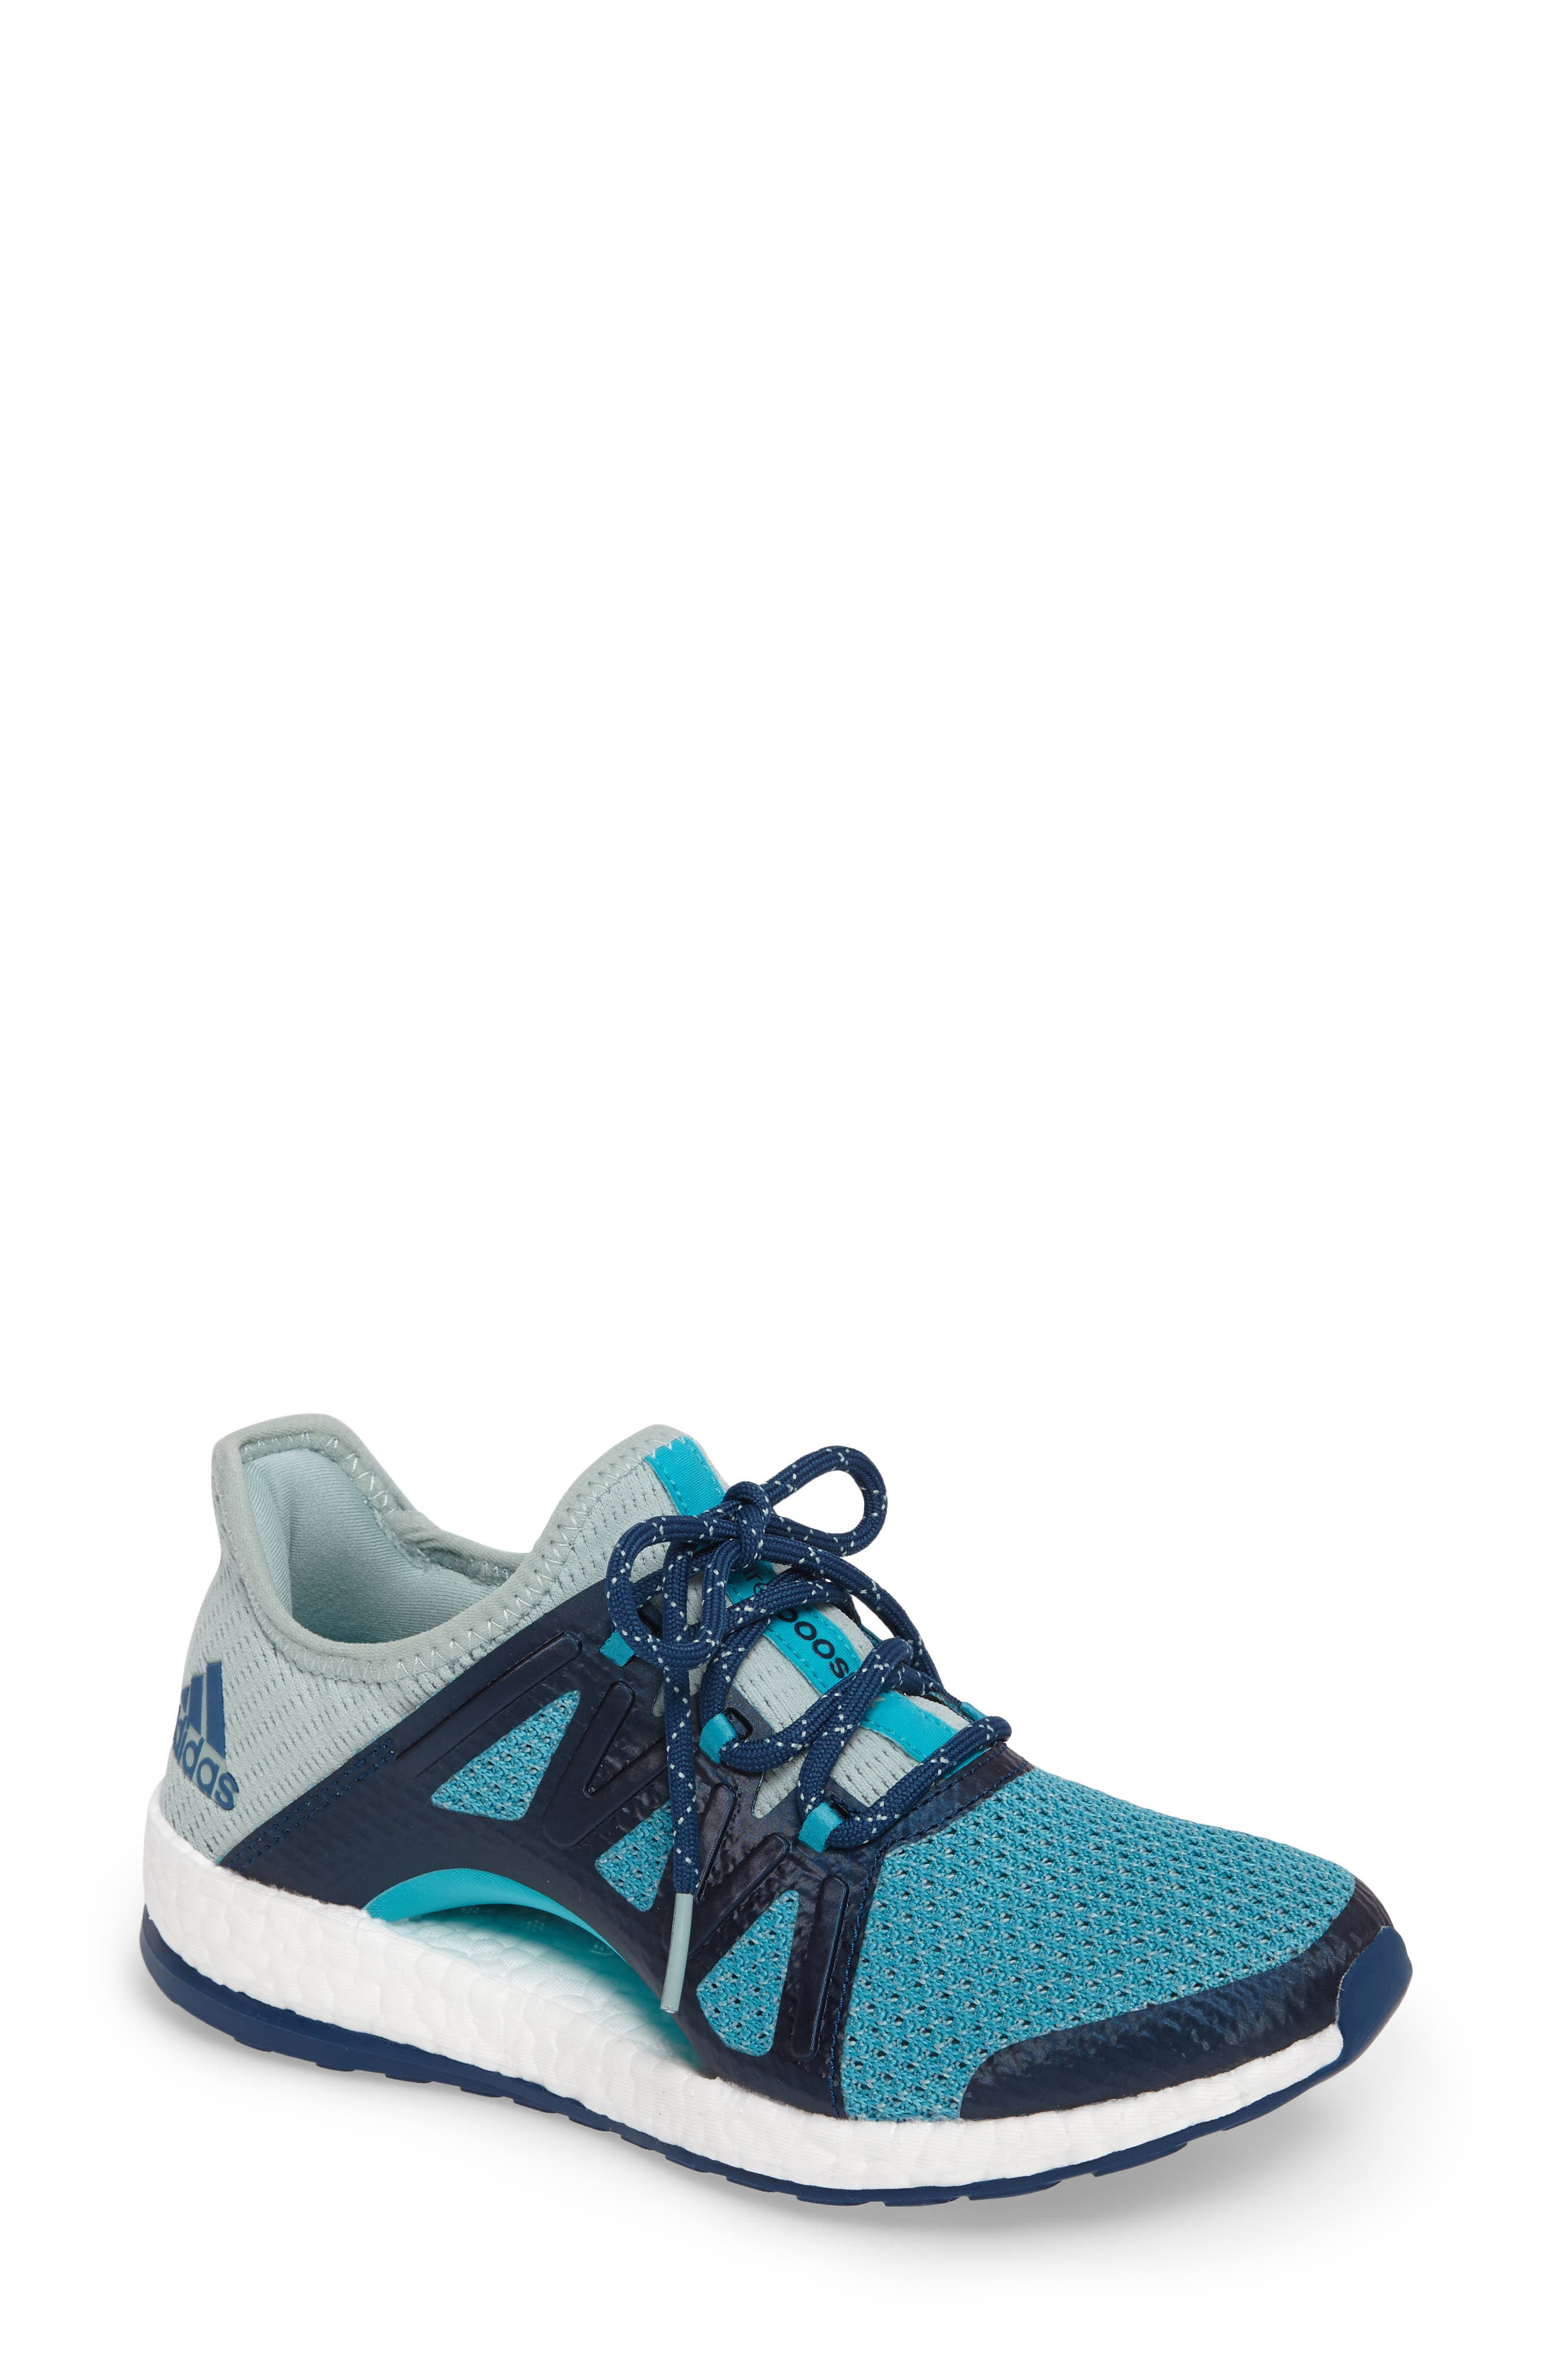 PureBOOST Xpose Running Shoe,                             Main thumbnail 1, color,                             Tactile Green/ Energy Blue